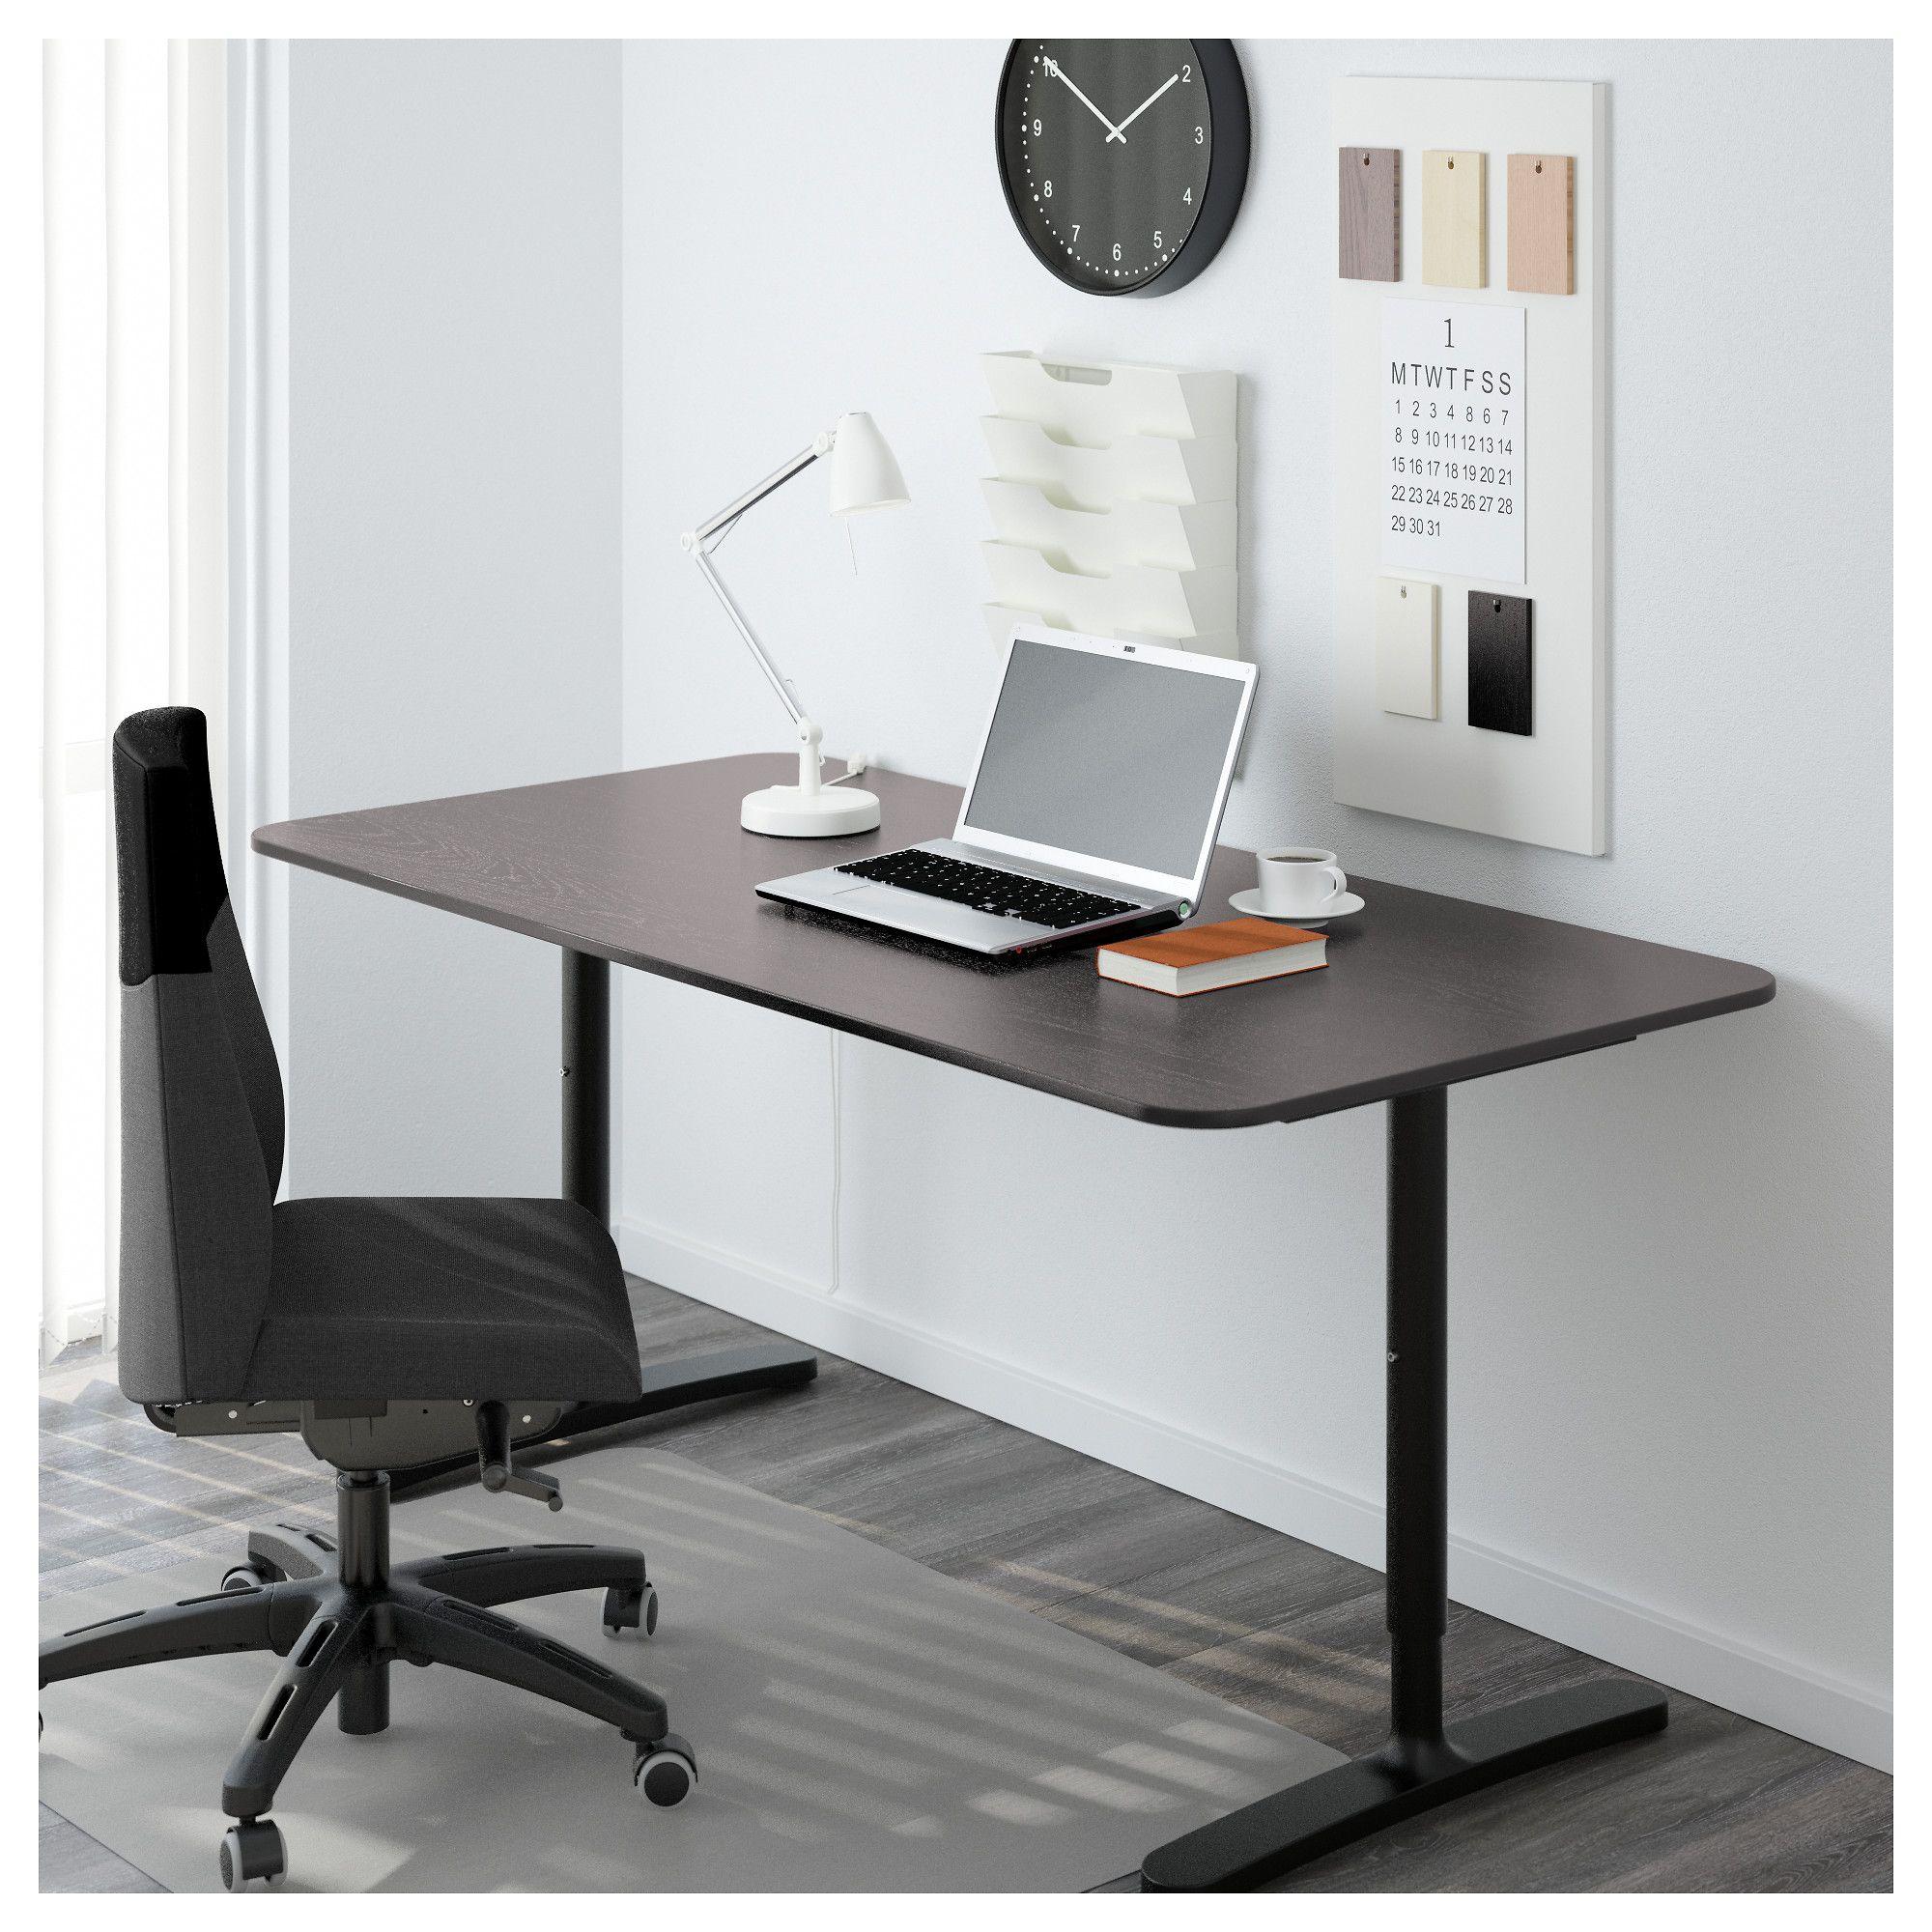 Great 3 Monitor Bekant Desk - 8b7bb58604b83339c38e48b6410486a5  Collection_59978.jpg